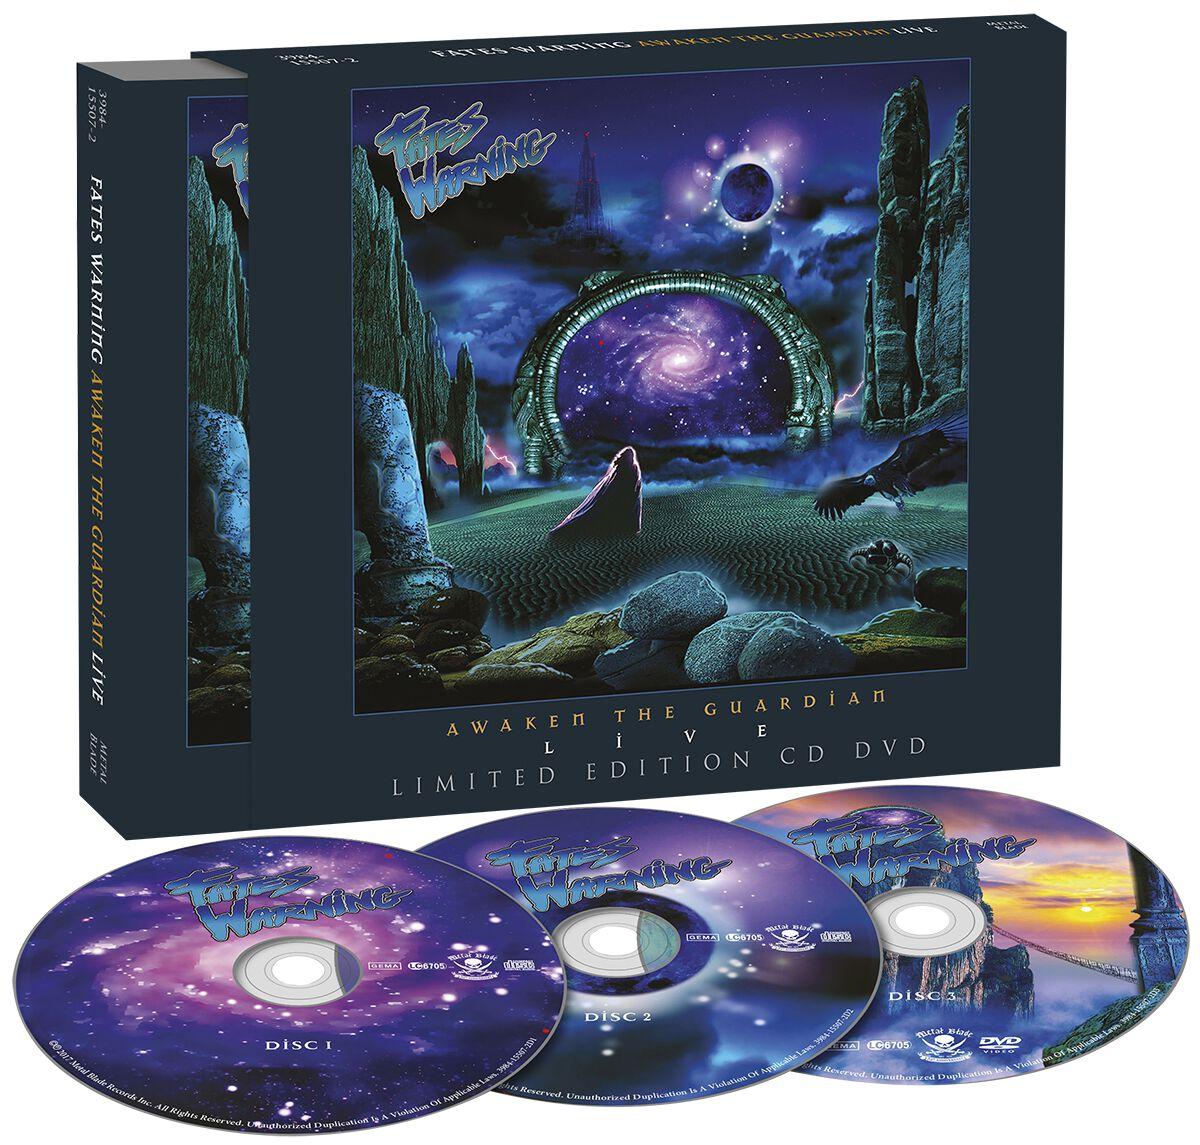 Image of Fates Warning Awaken the guardian - Live 2-CD & DVD Standard